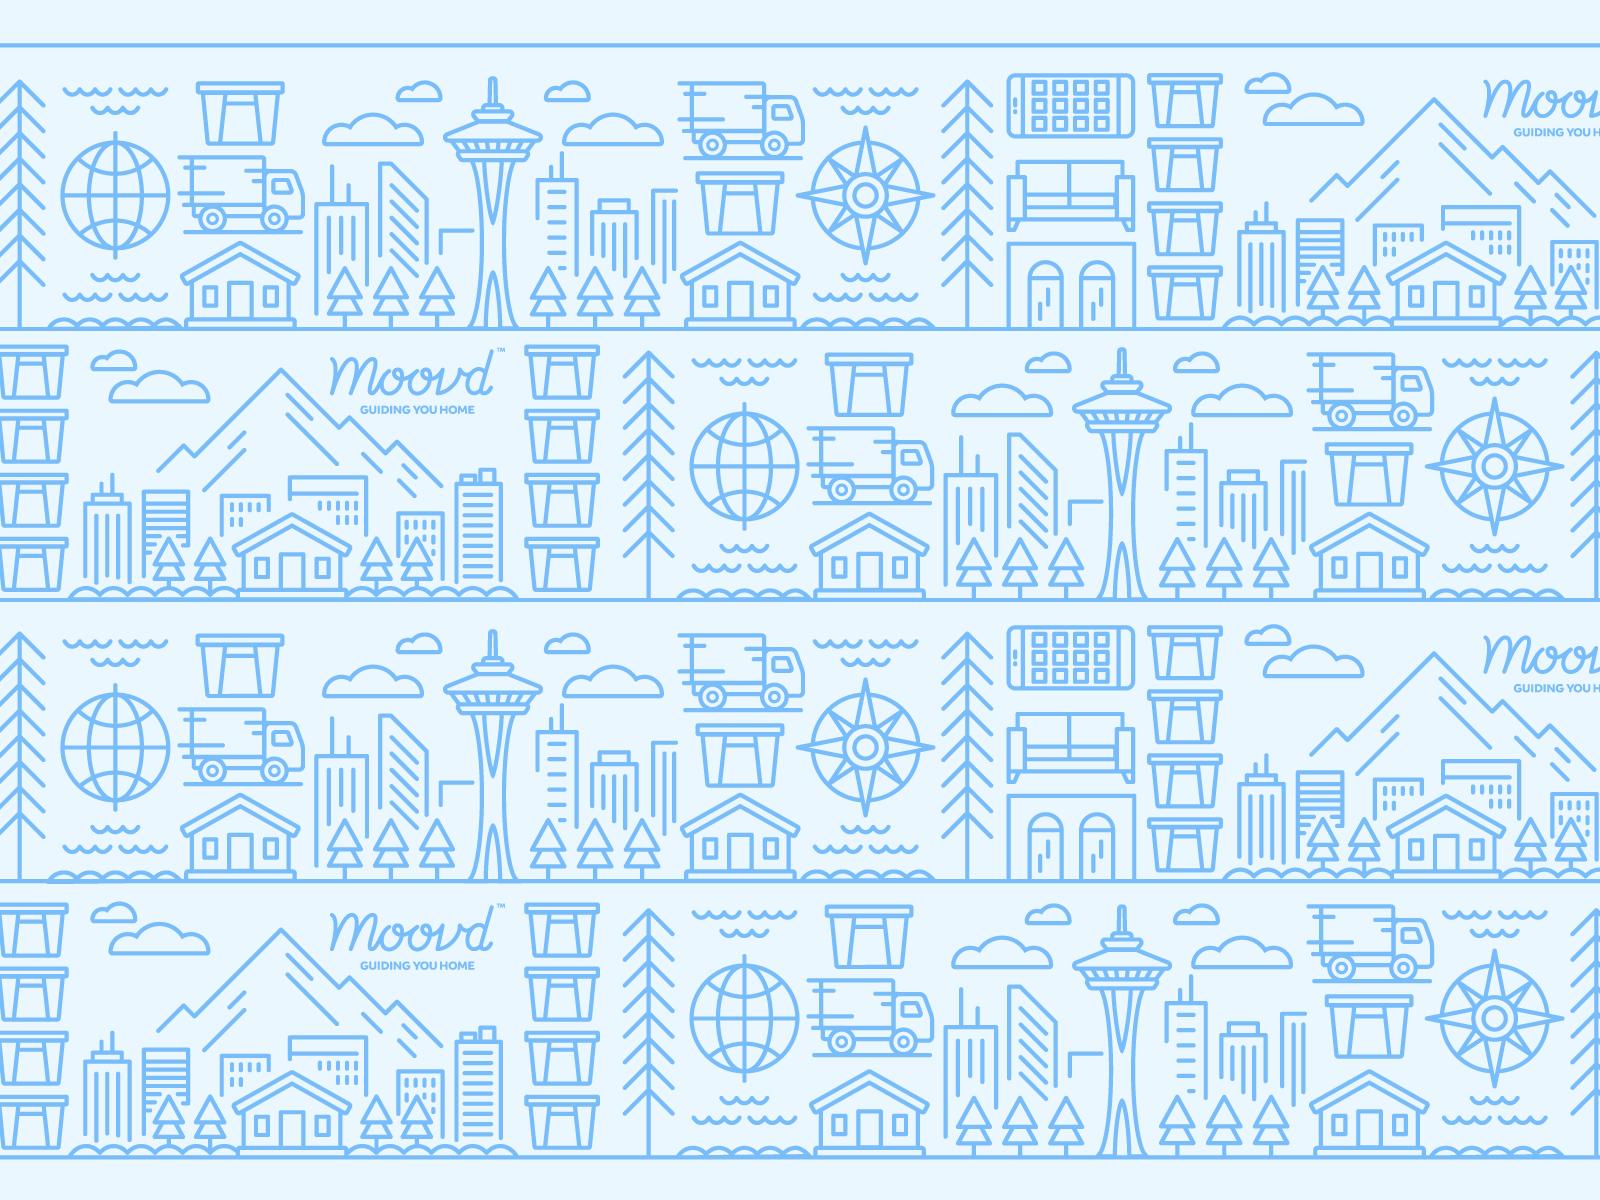 dribbble_rocky-roark_moovd_illustration_pattern